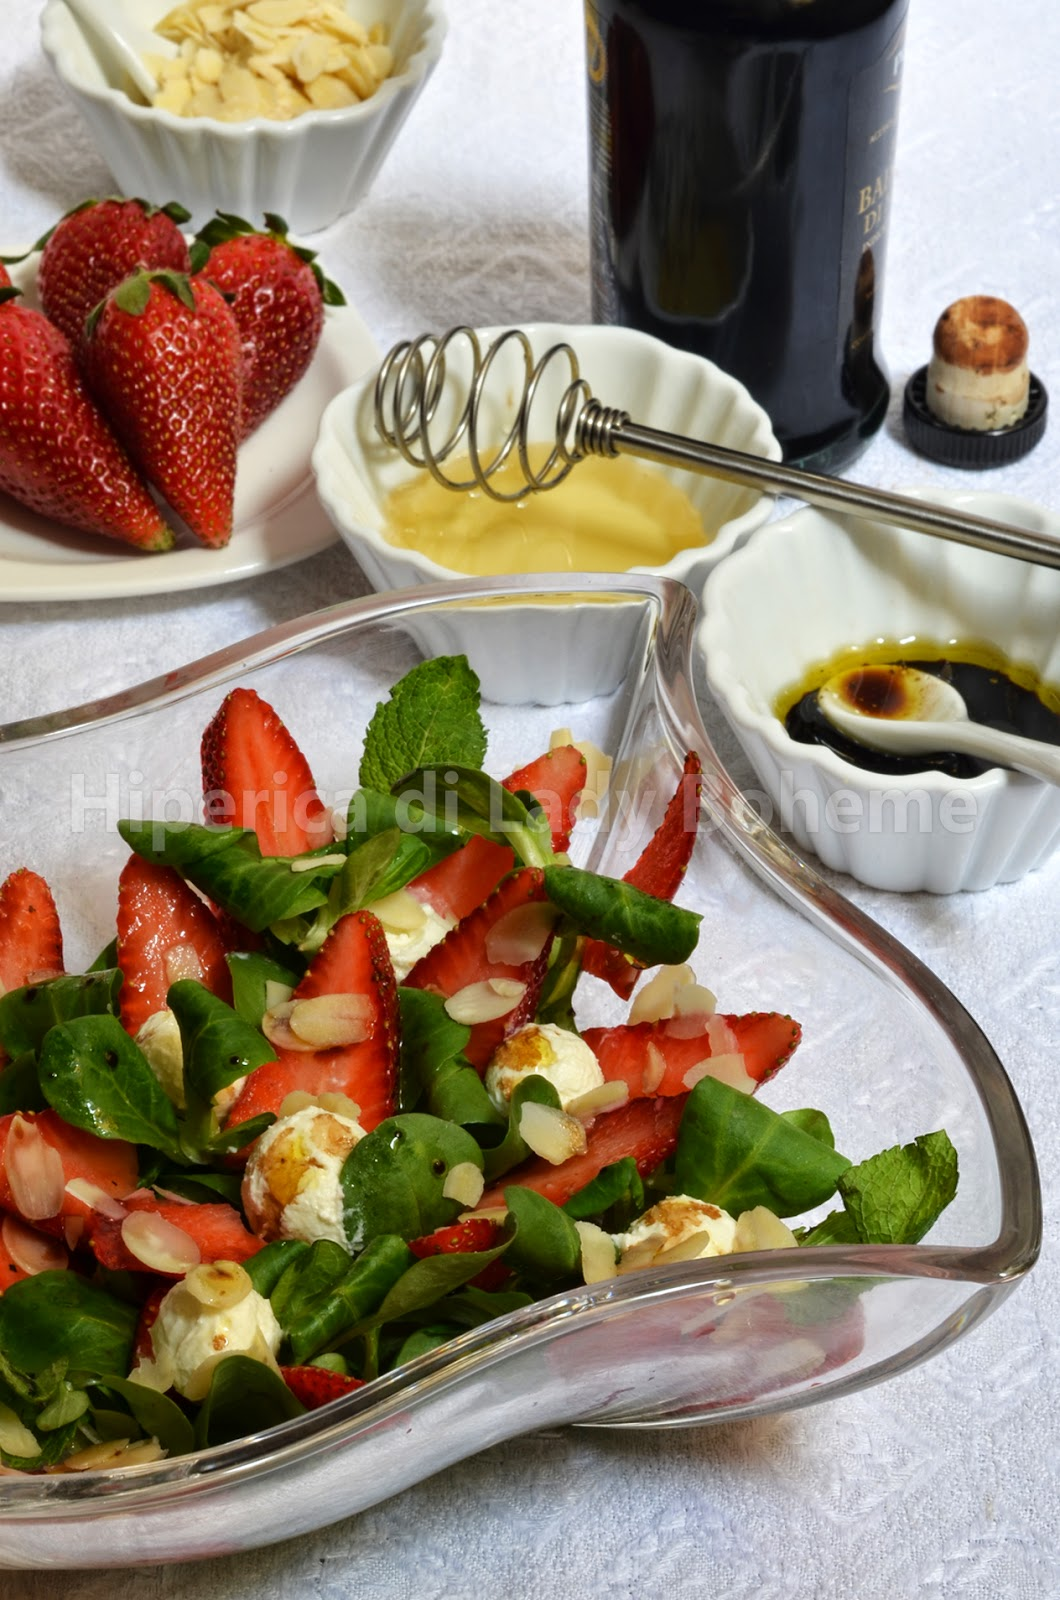 hiperica_lady_boheme_blog_cucina_ricette_gustose_facili_veloci_insalata_di_fragole_soncino_robiola_2